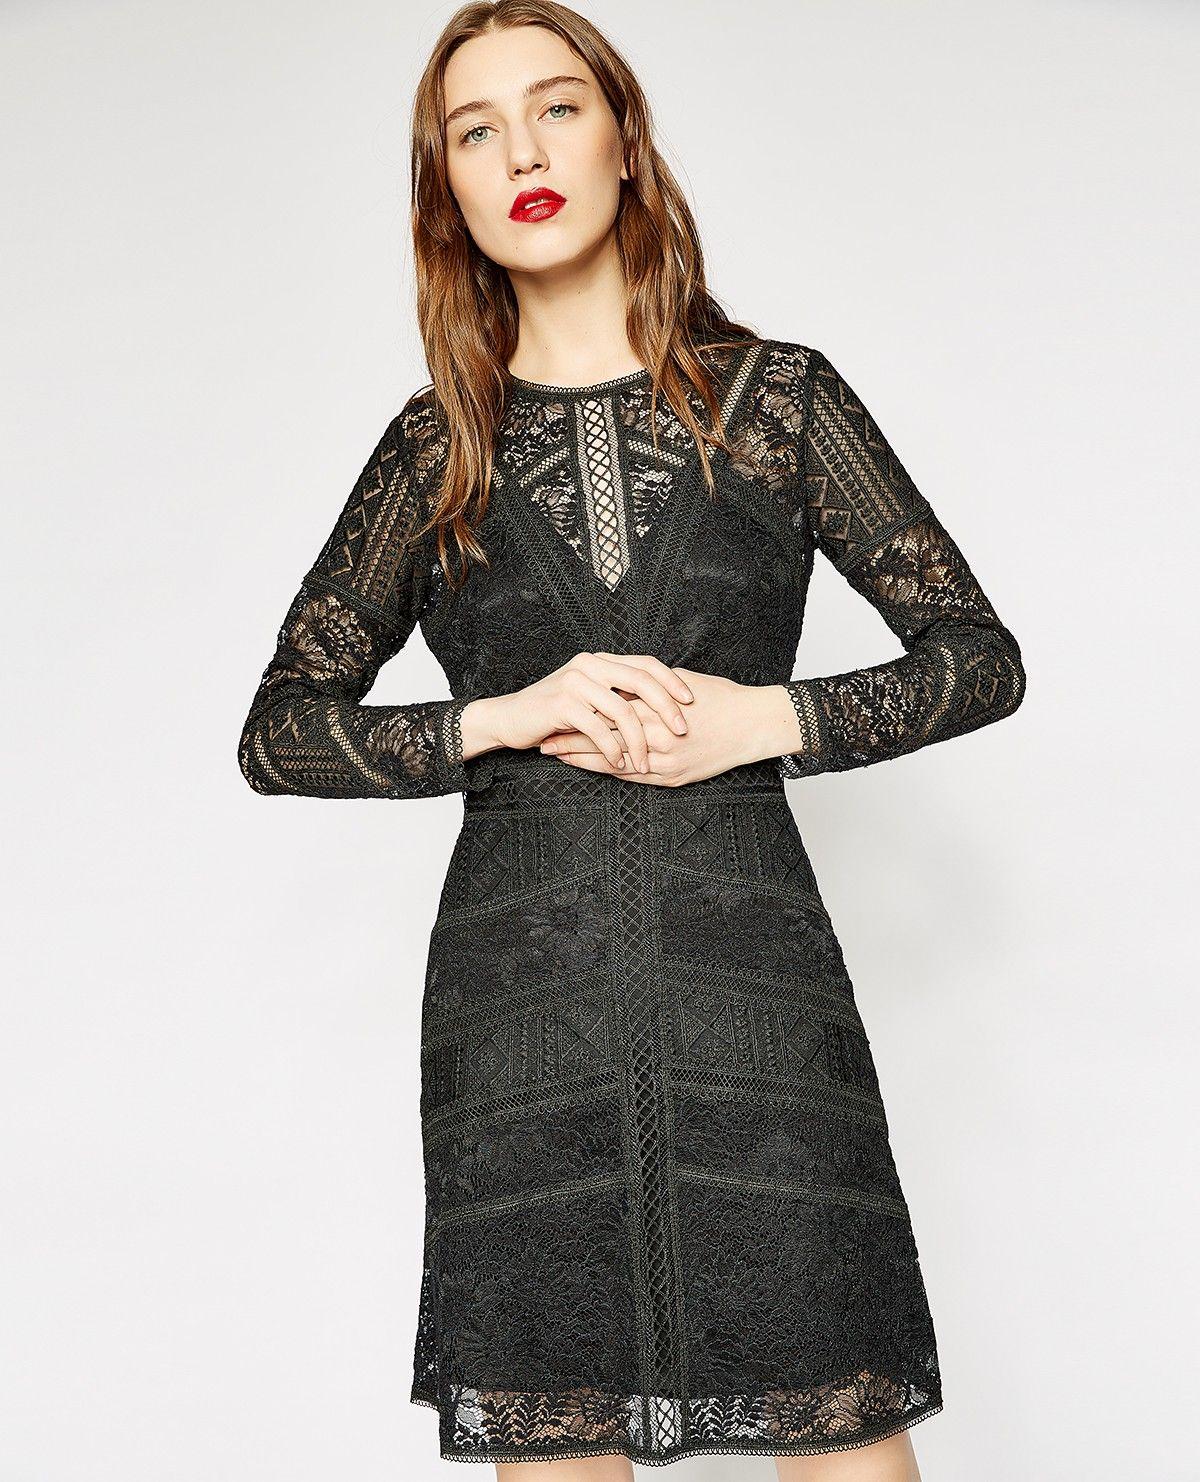 Schwarzes Spitzenkleid | Kleid spitze, Schwarzes spitzenkleid